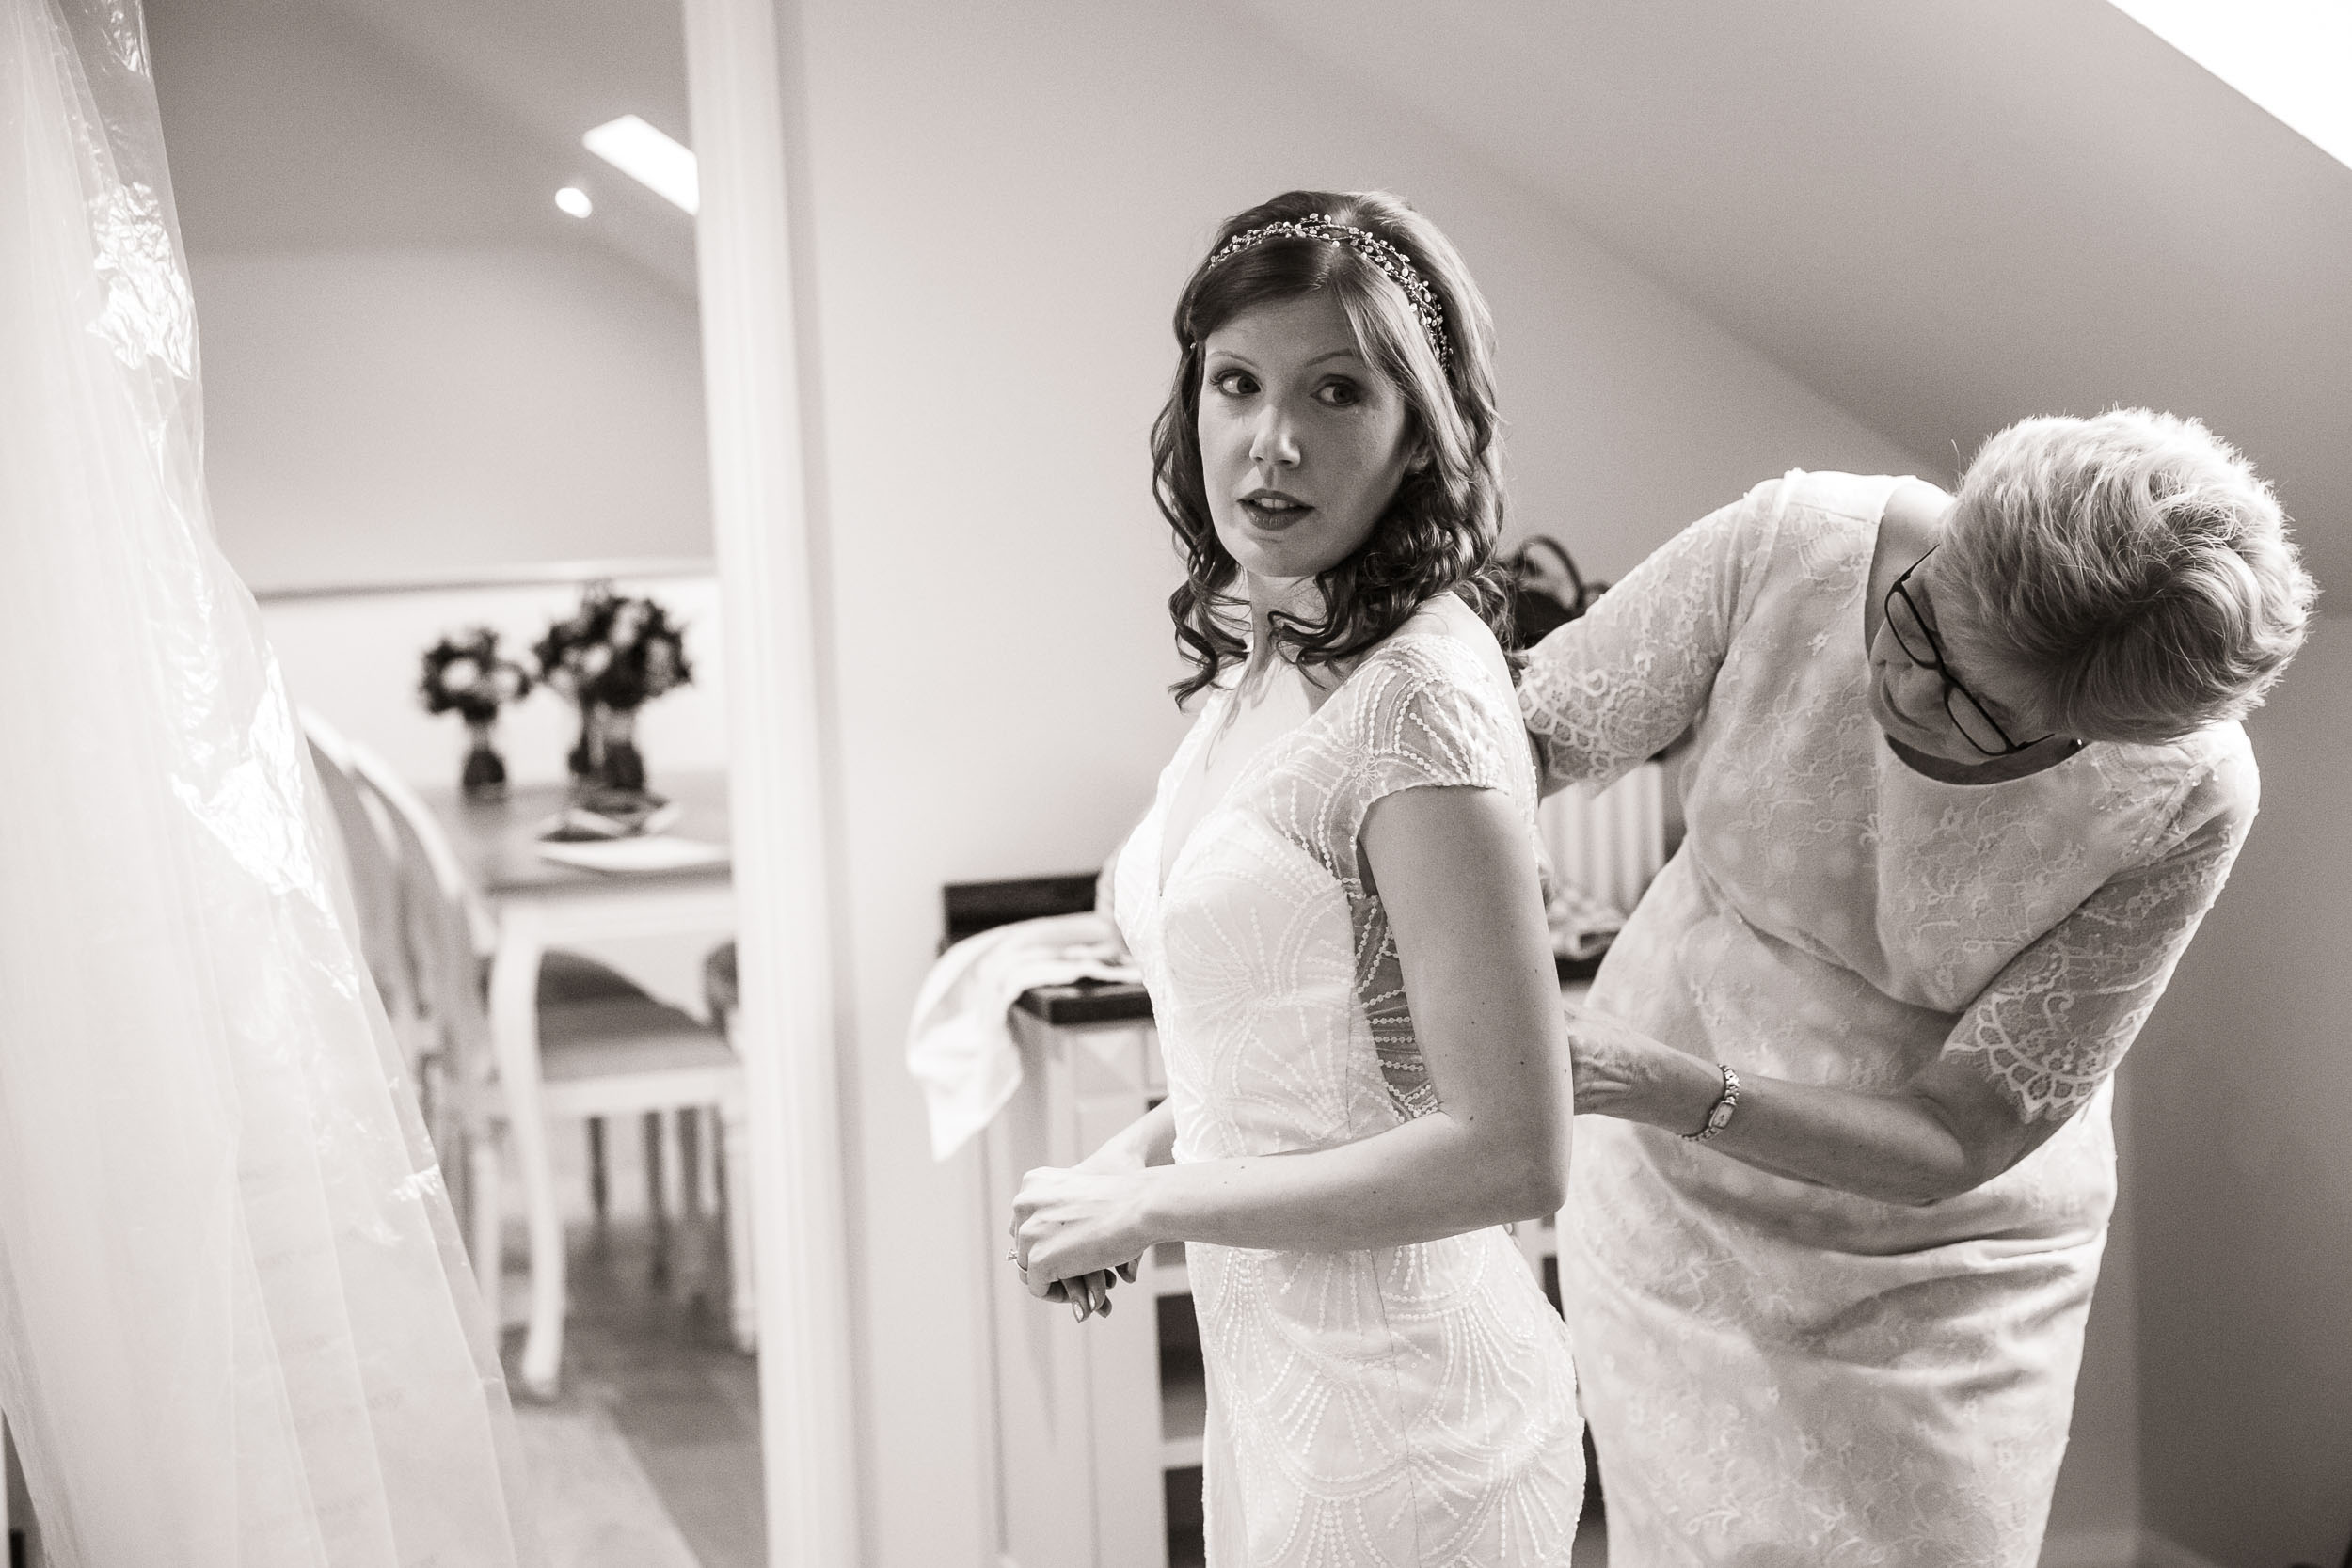 micklefield-hall-wedding-photographer 010.jpg